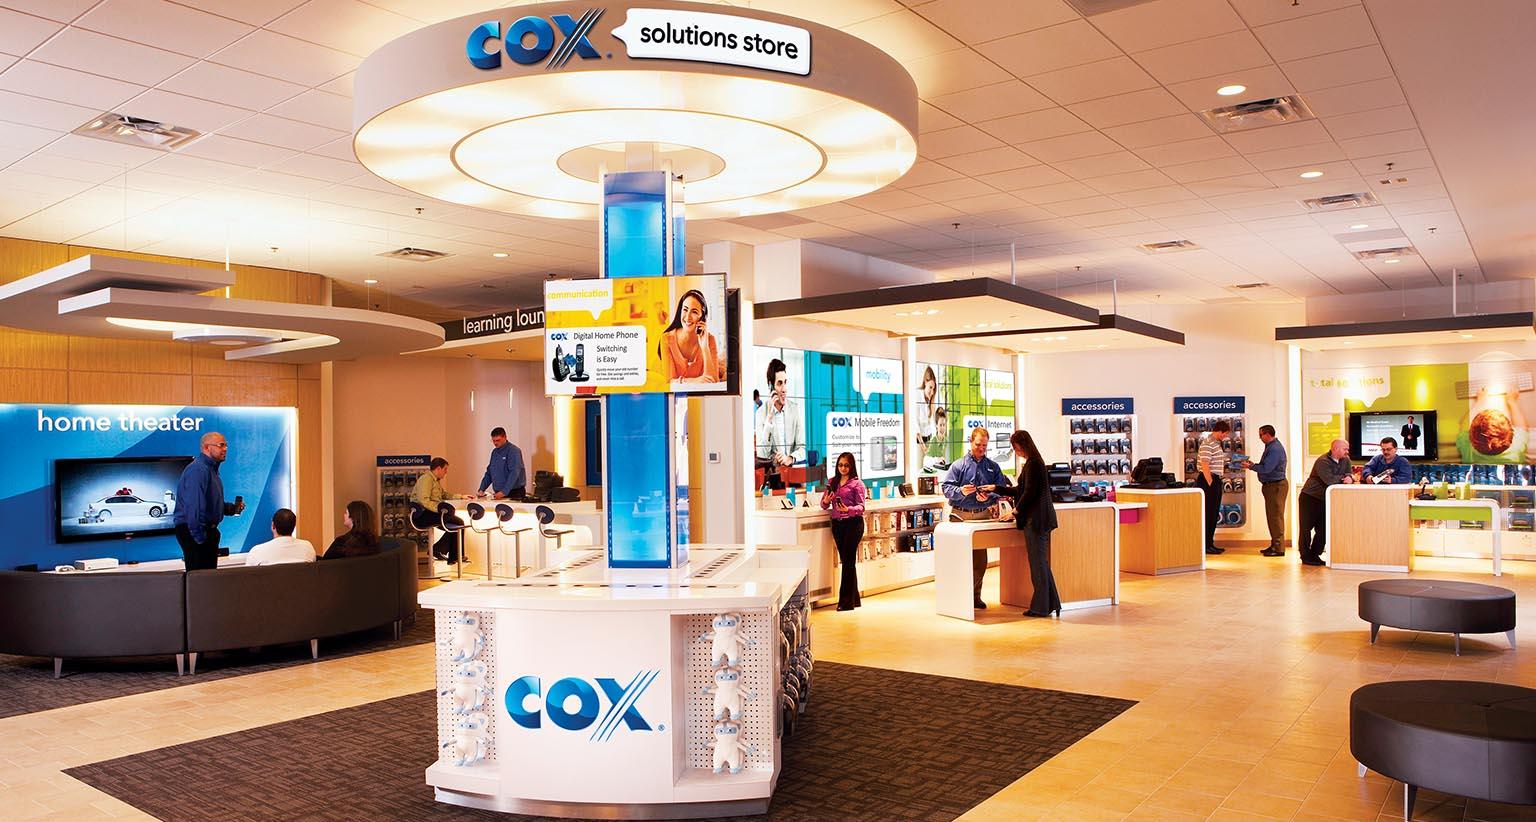 Cpl Retail Energy Customer Service